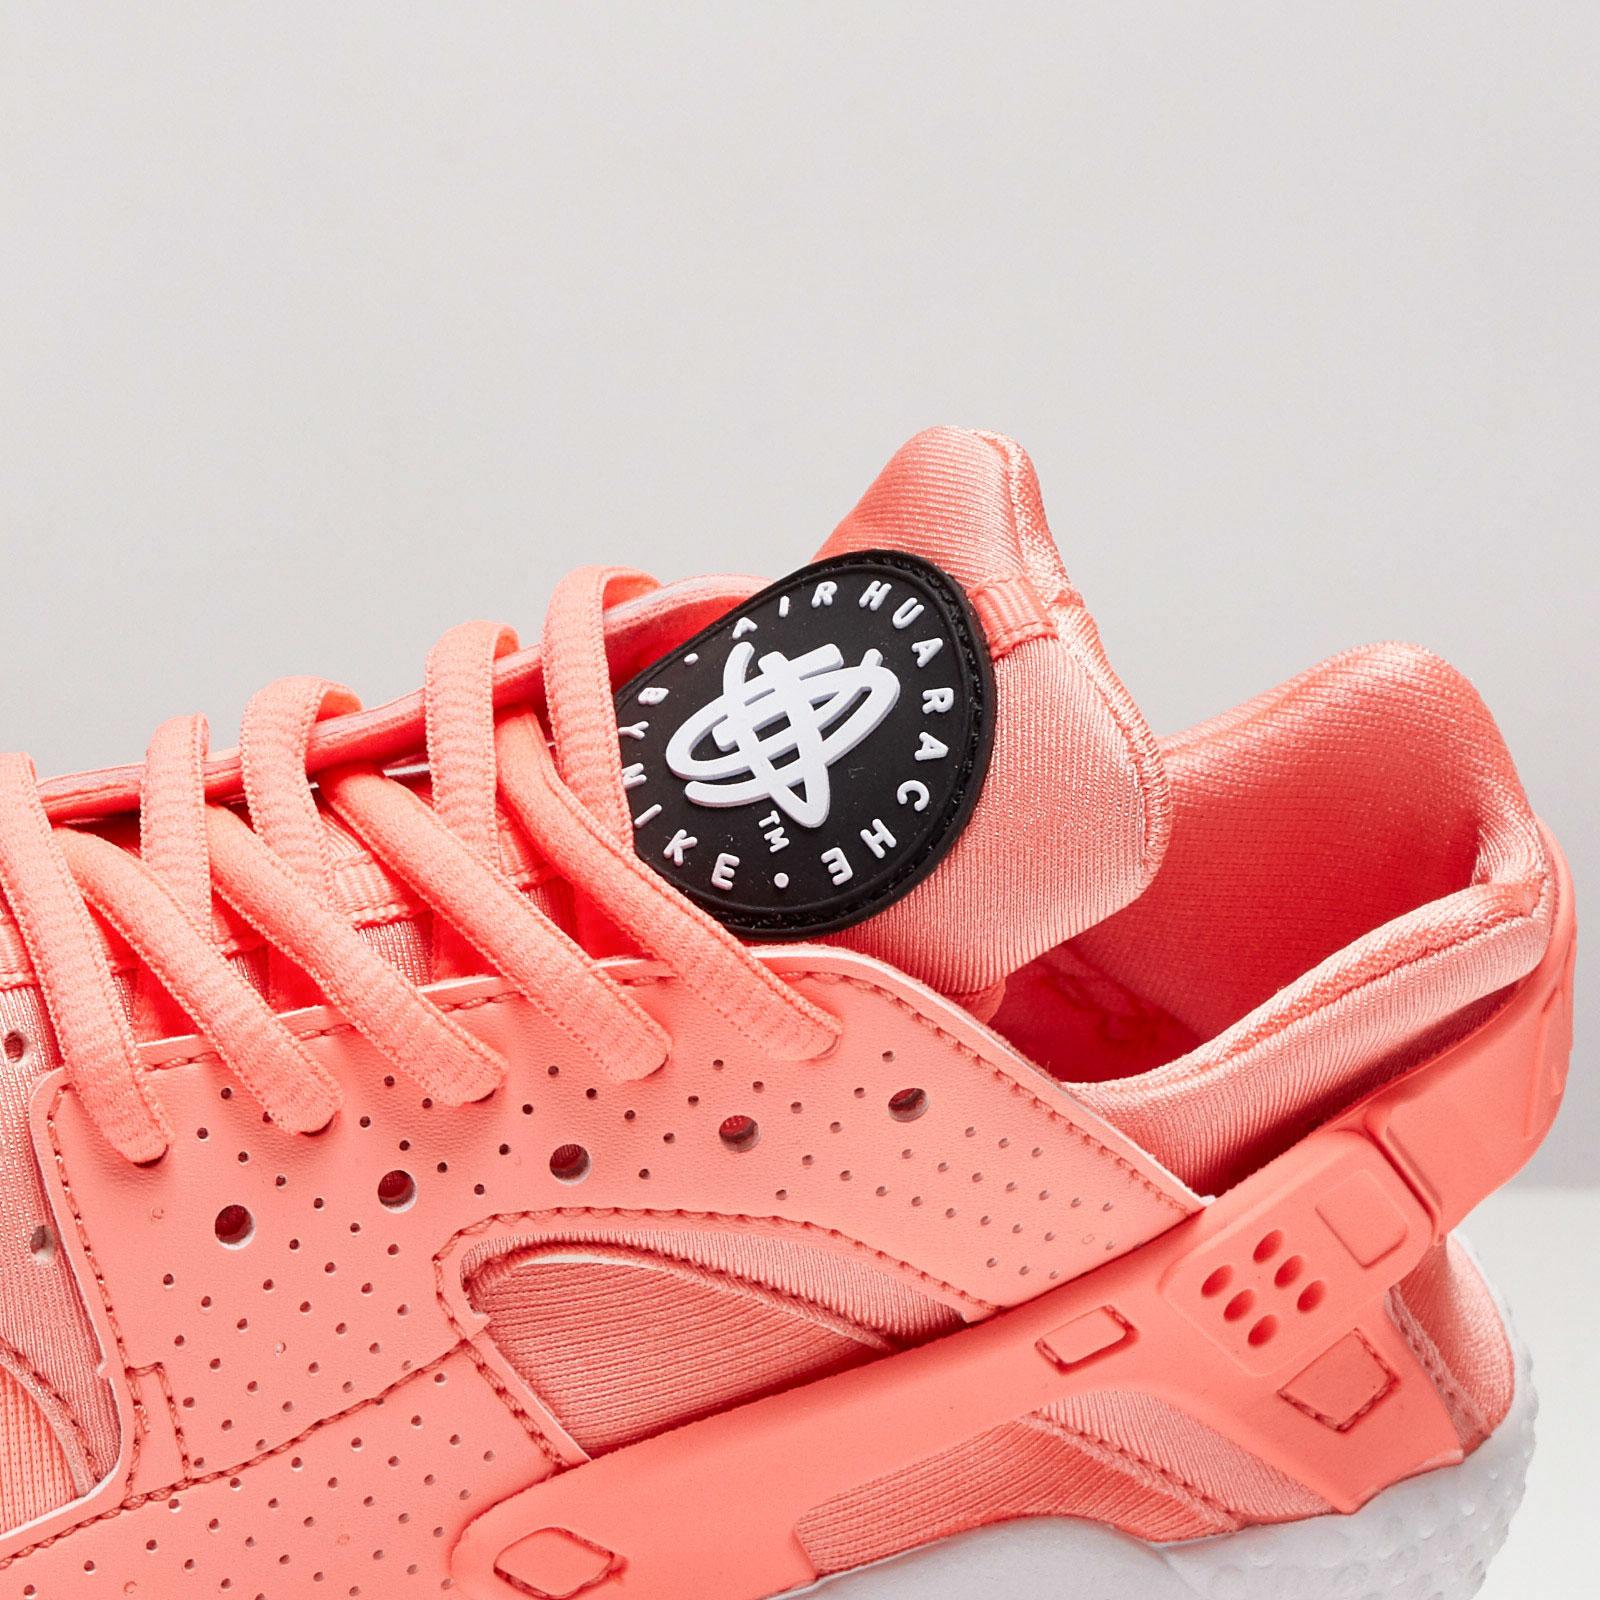 d3ff965f85c1 Nike Wmns Air Huarache Run - 634835-603 - Sneakersnstuff